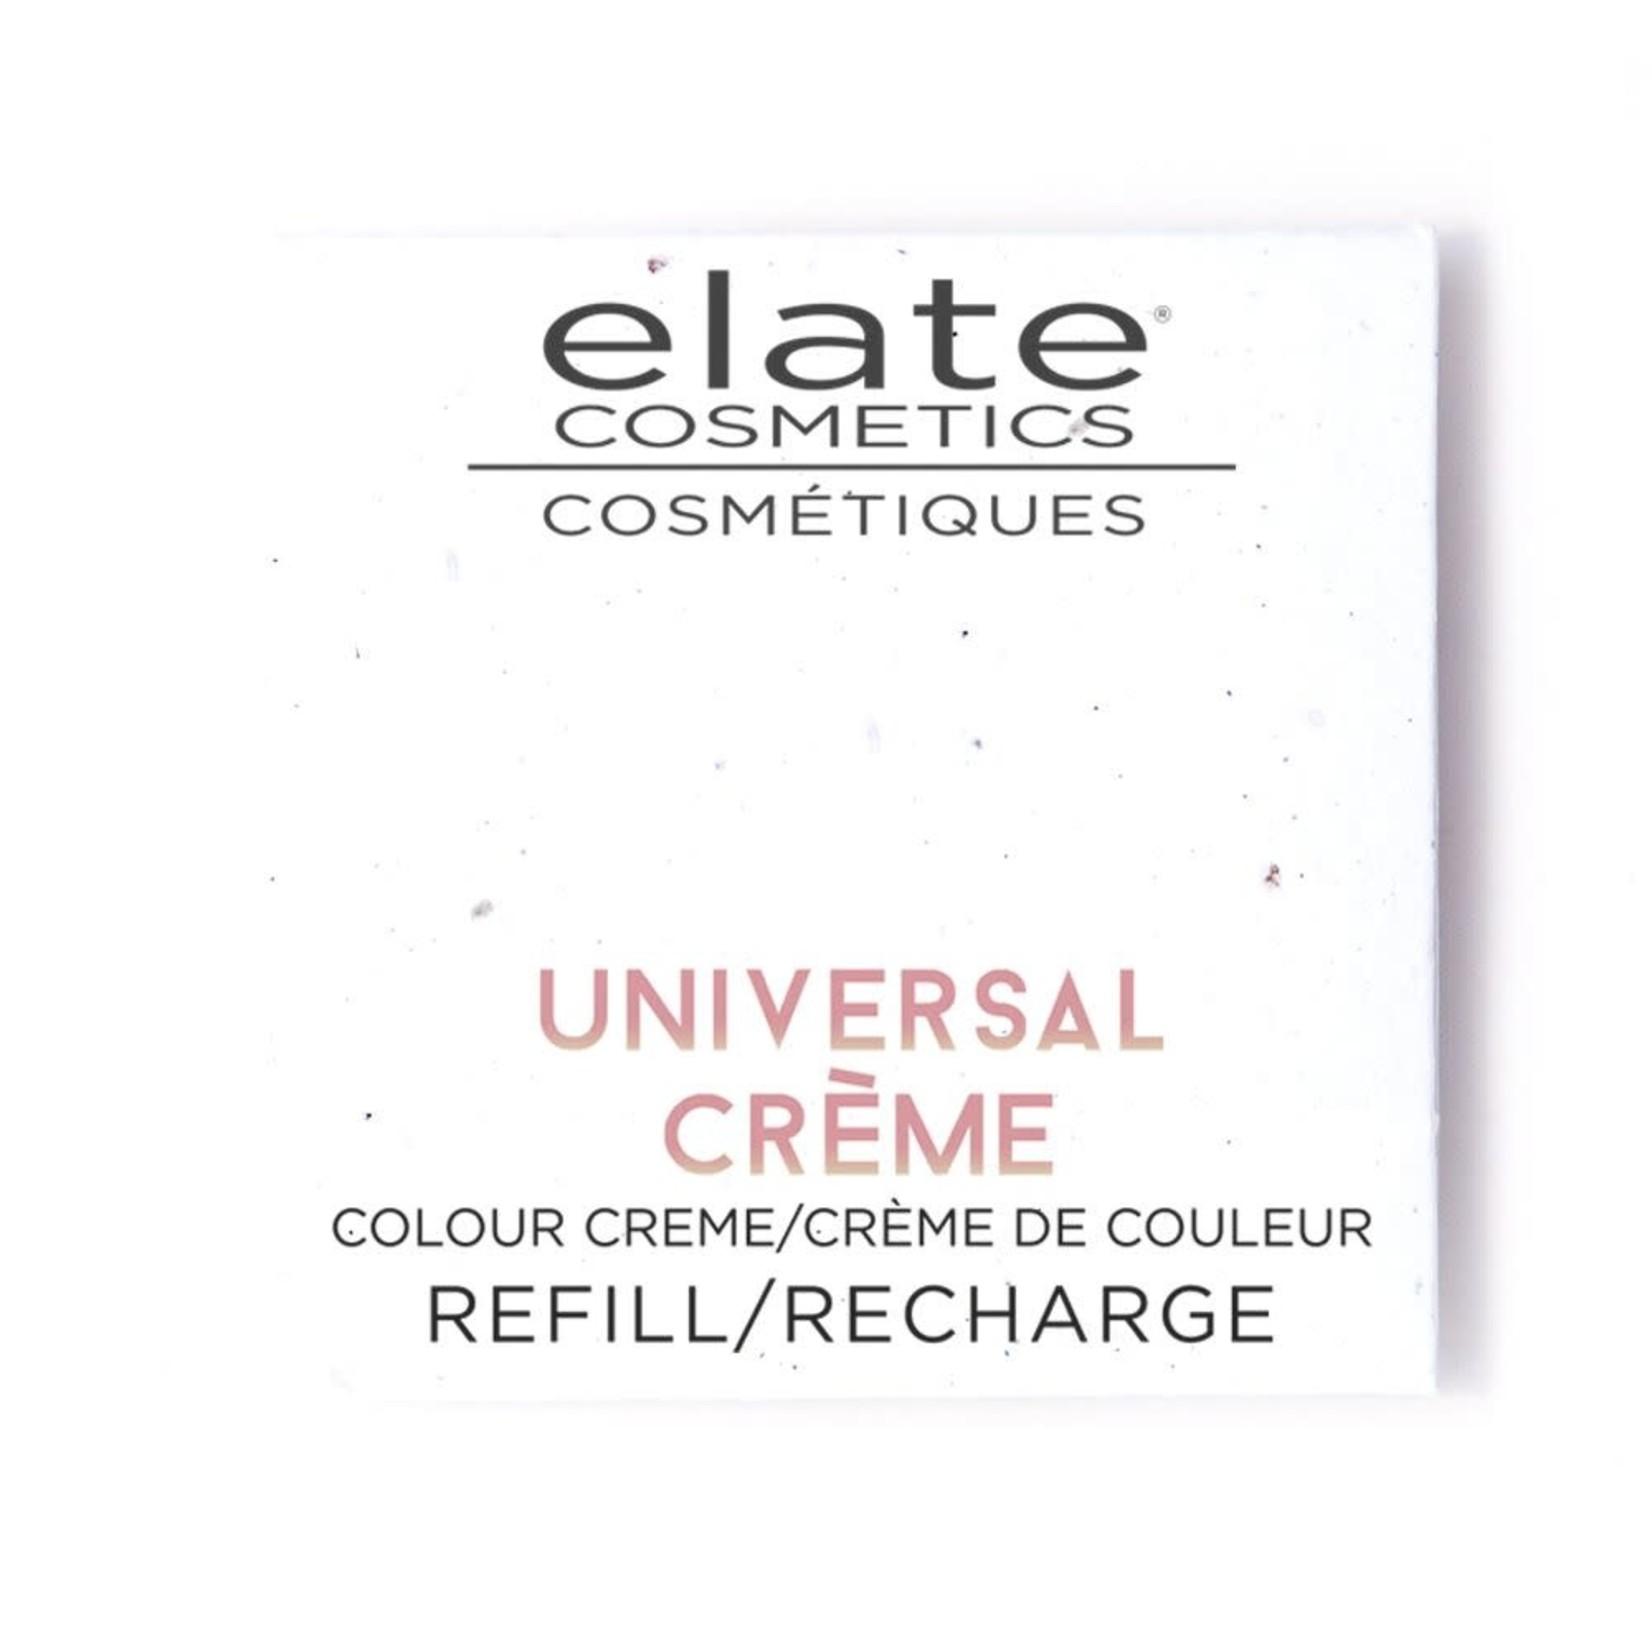 ELATE COSMETICS UNIVERSAL CREME - ELATION